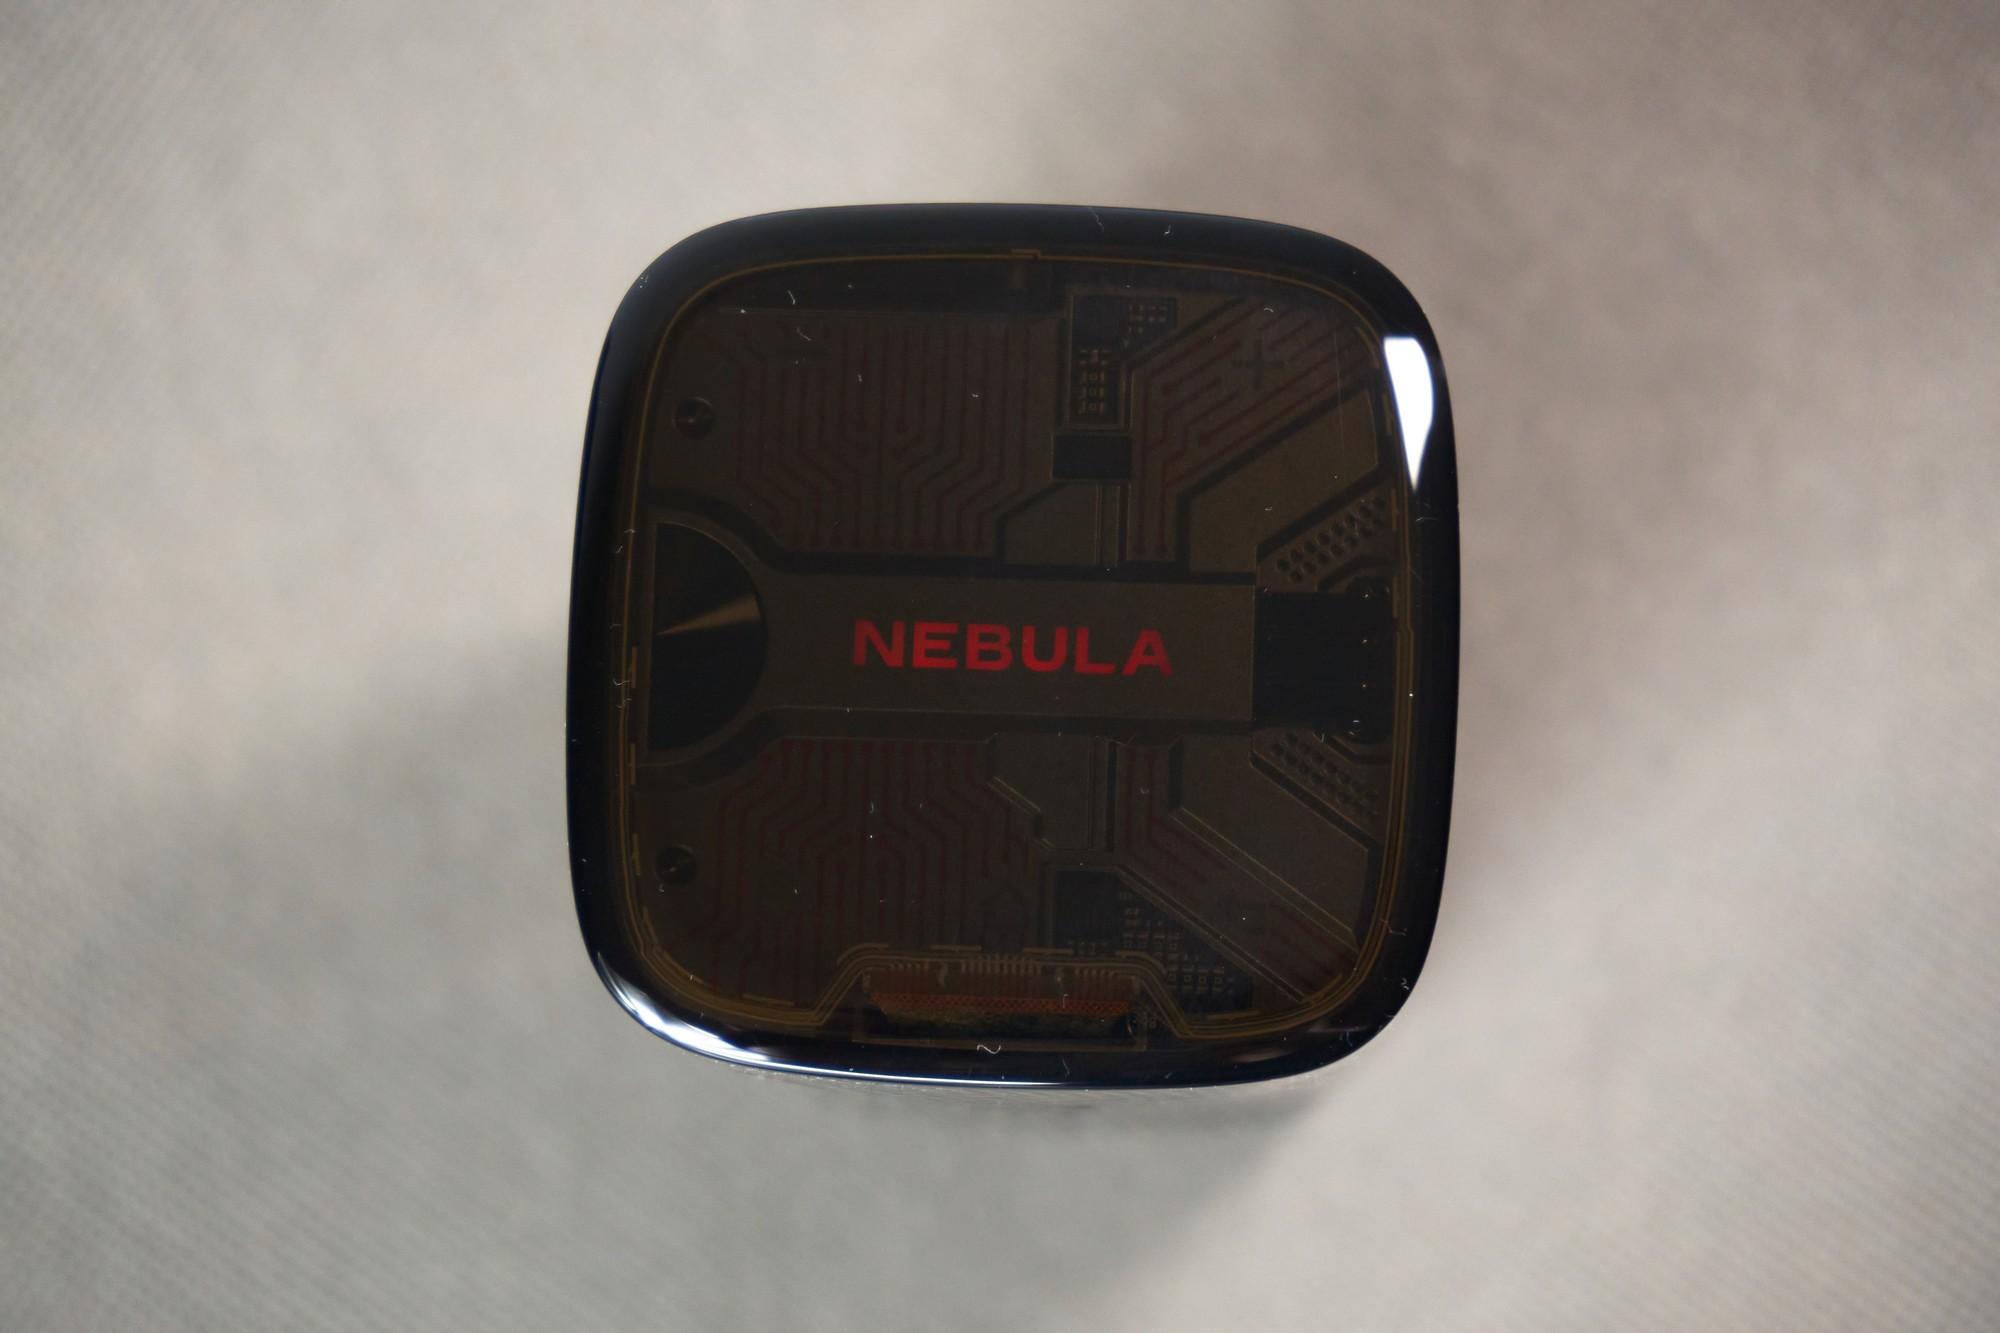 Anker Nebula Apollo - niemobilny miniprojektor? (recenzja)